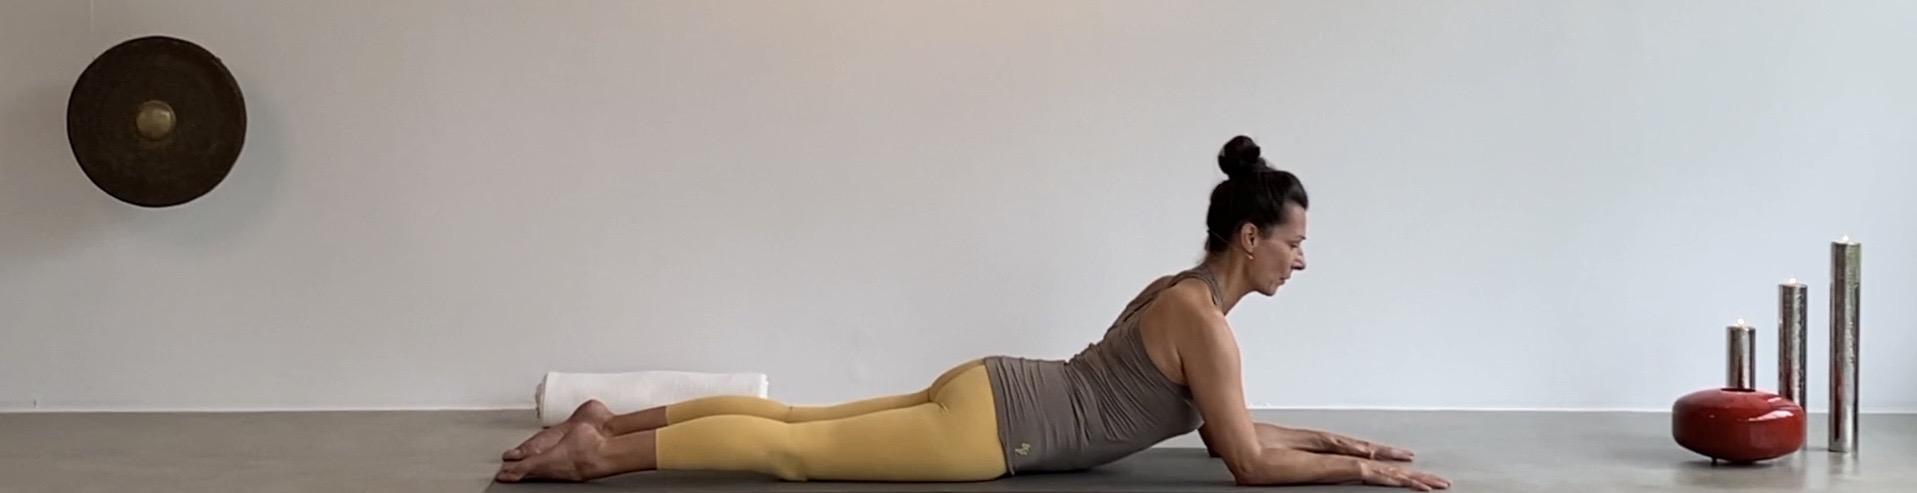 yogaatelier online Angela